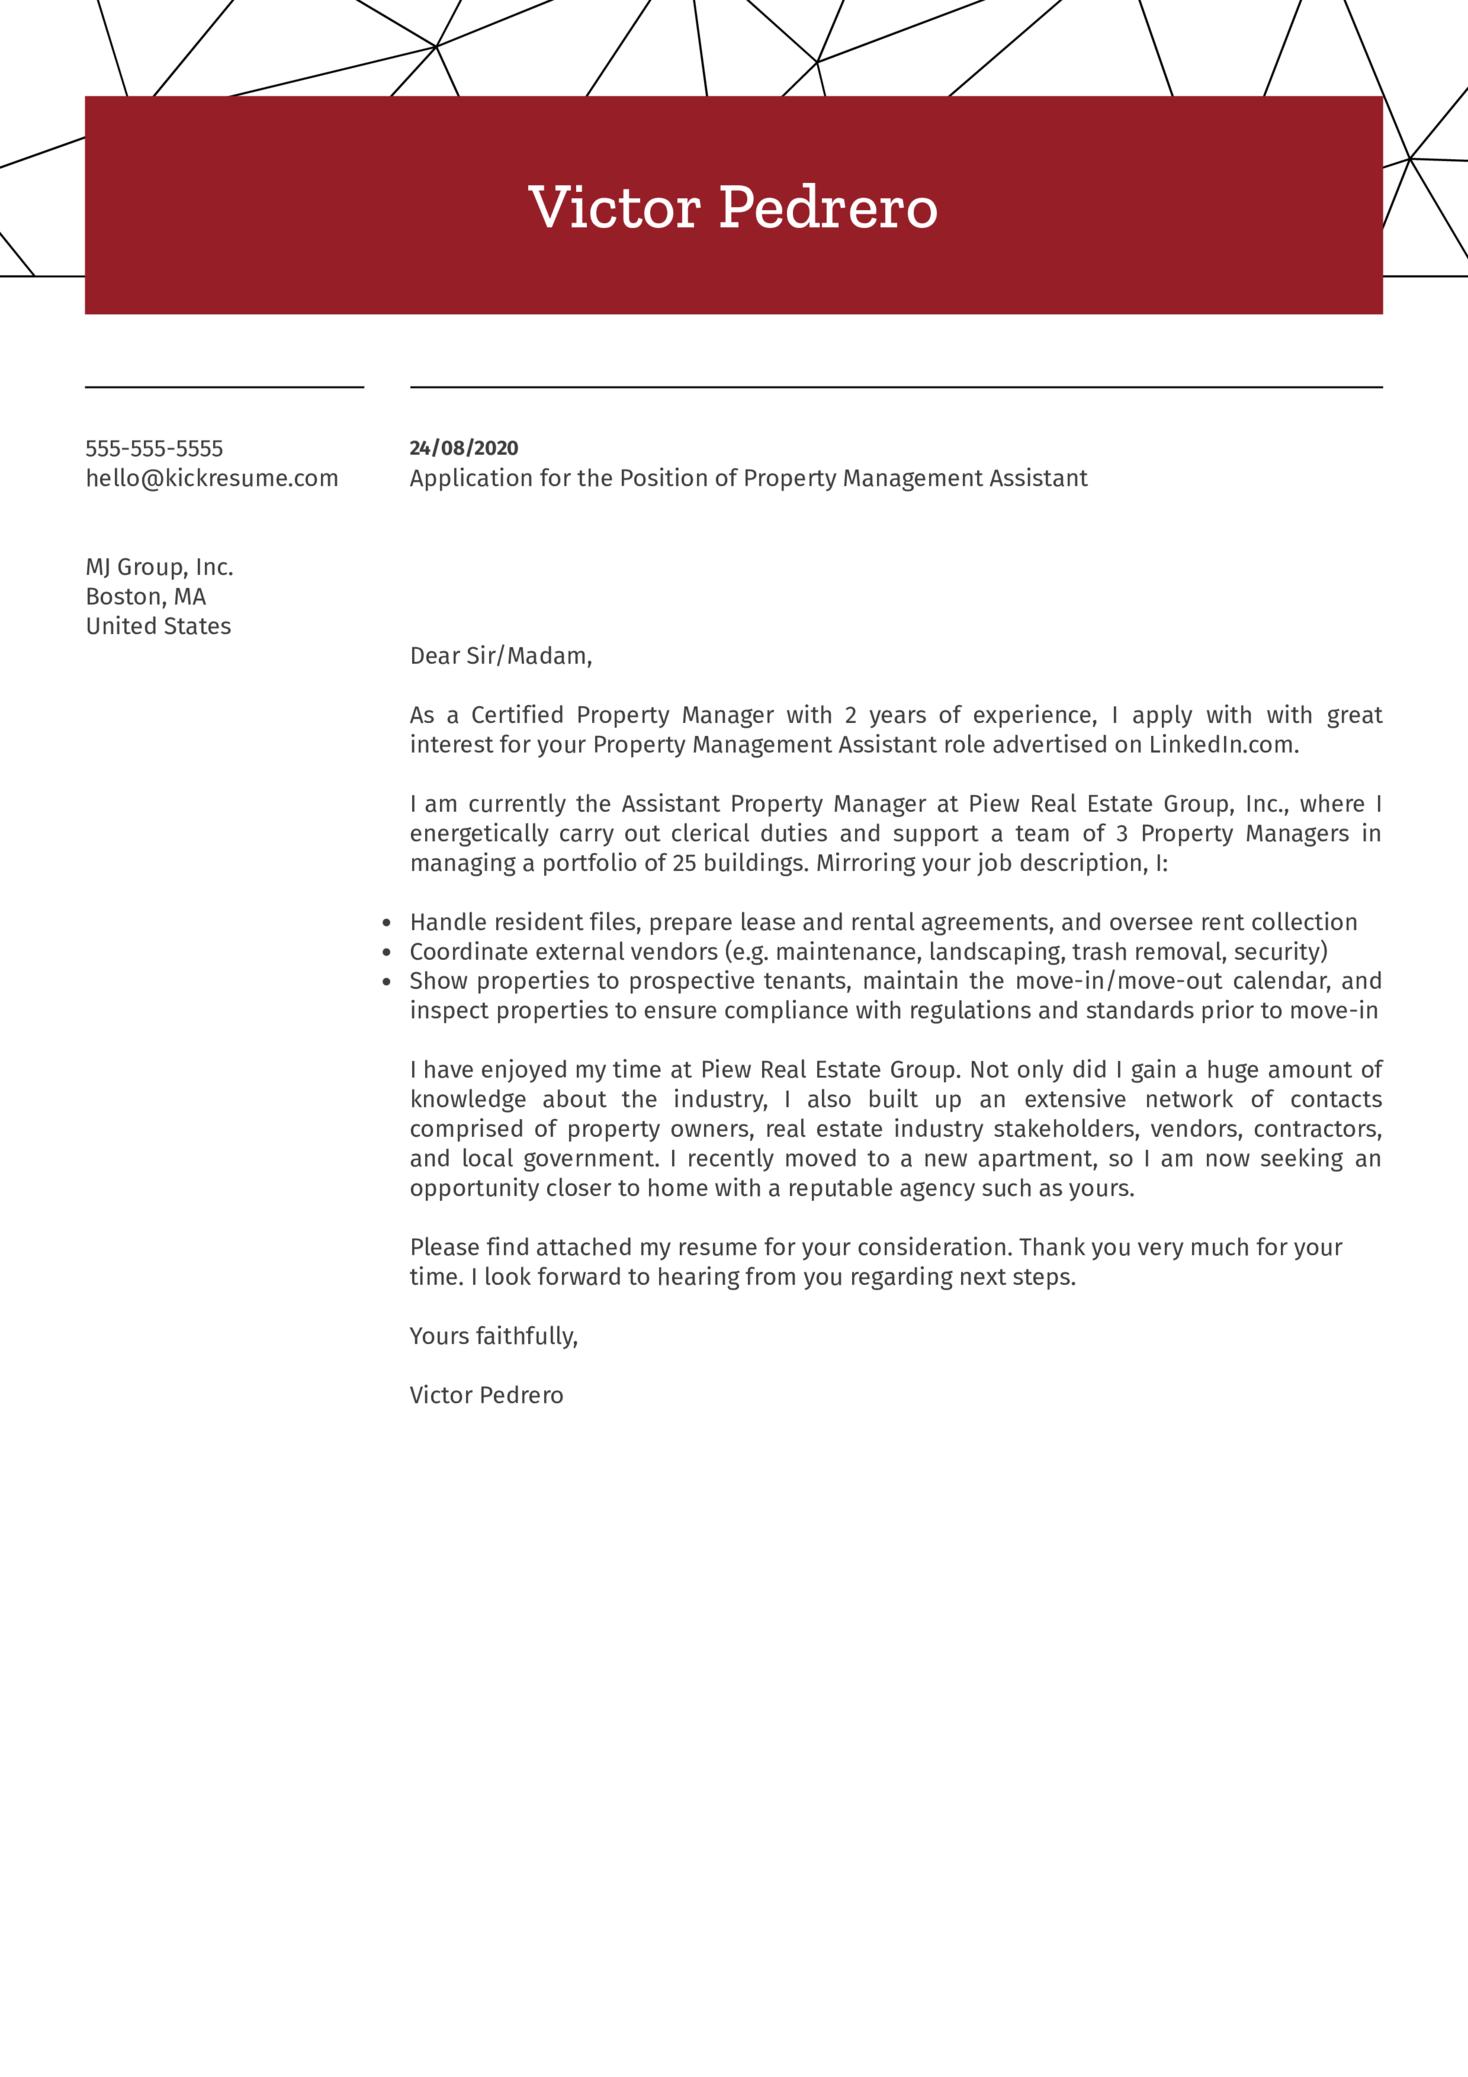 Property Management Assistant Cover Letter Sample